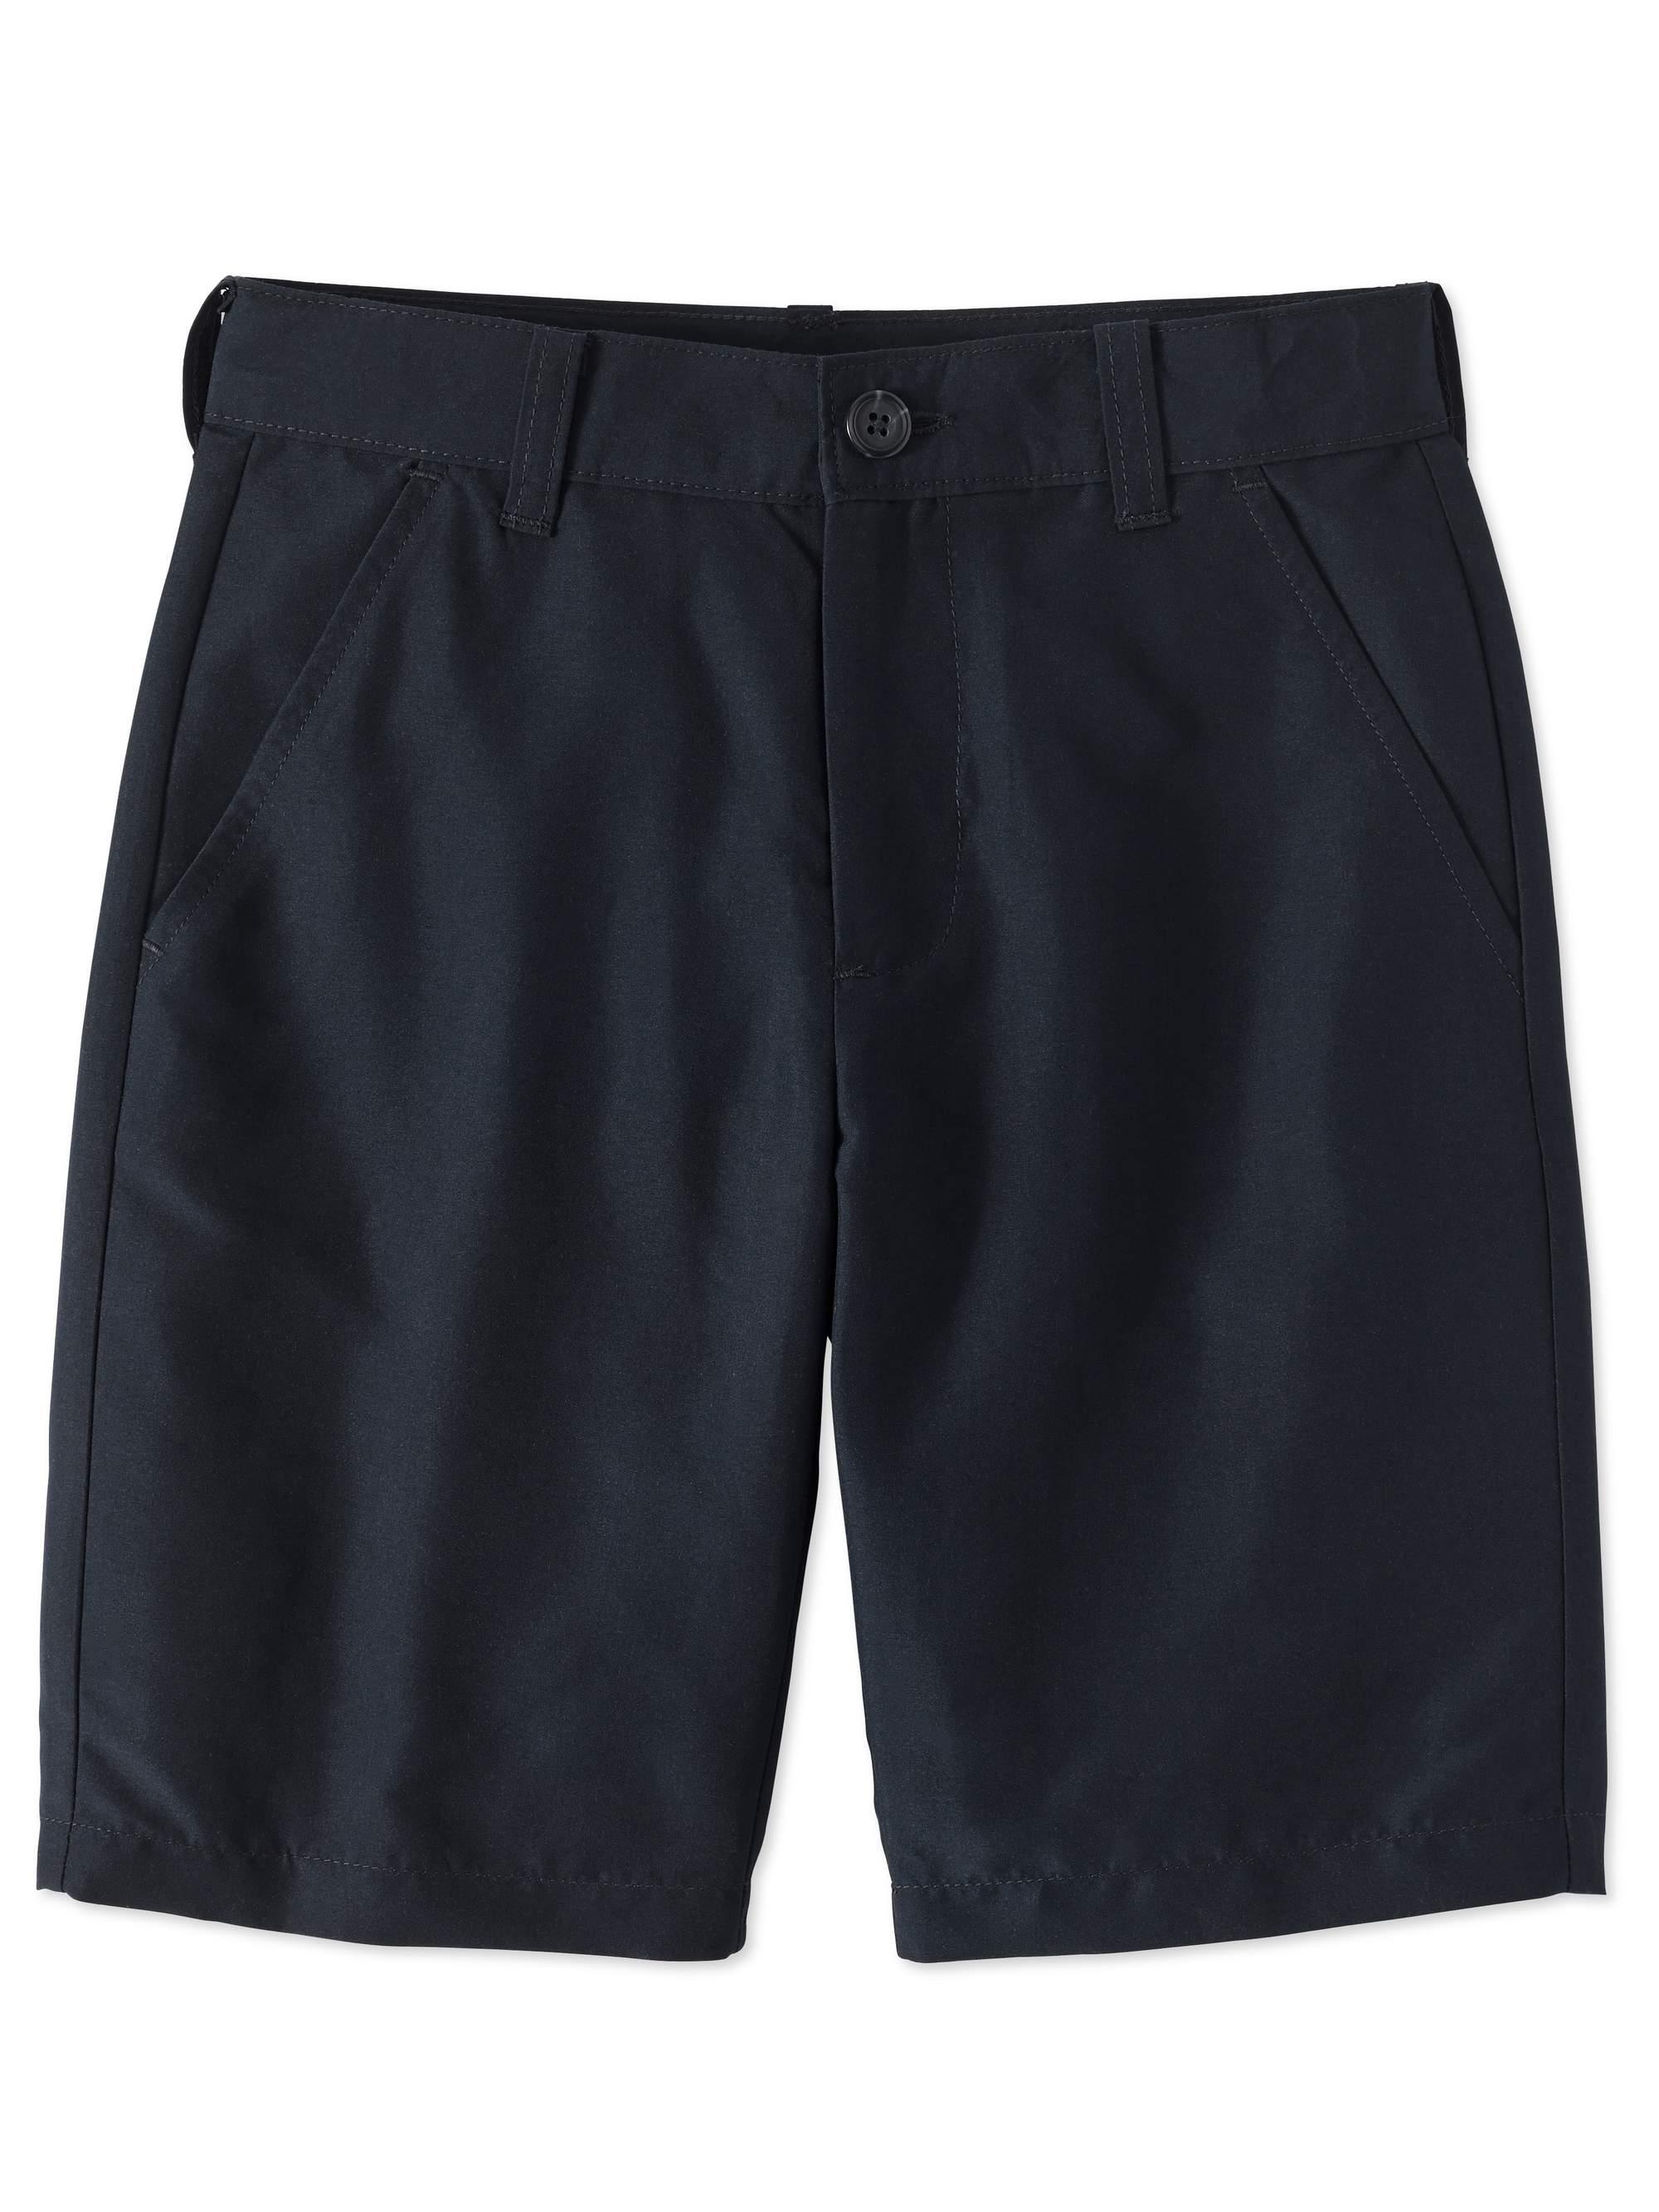 Boys Husky School Uniform Performance Shorts